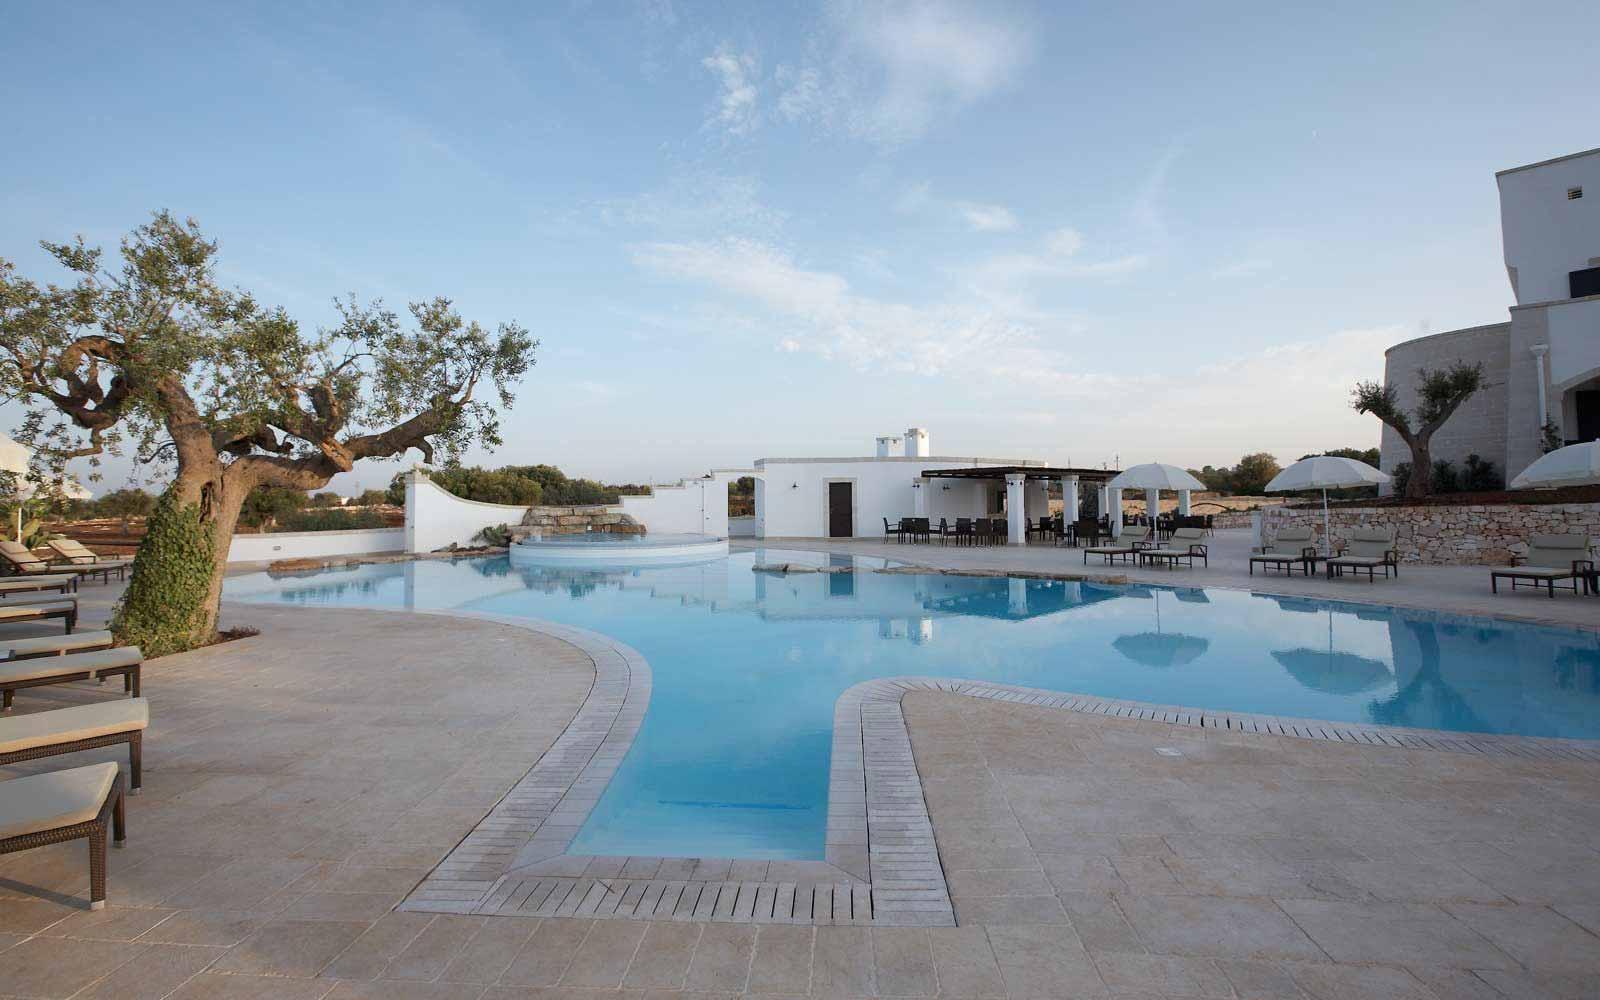 The swimming pool at Borgobianco Resort & Spa